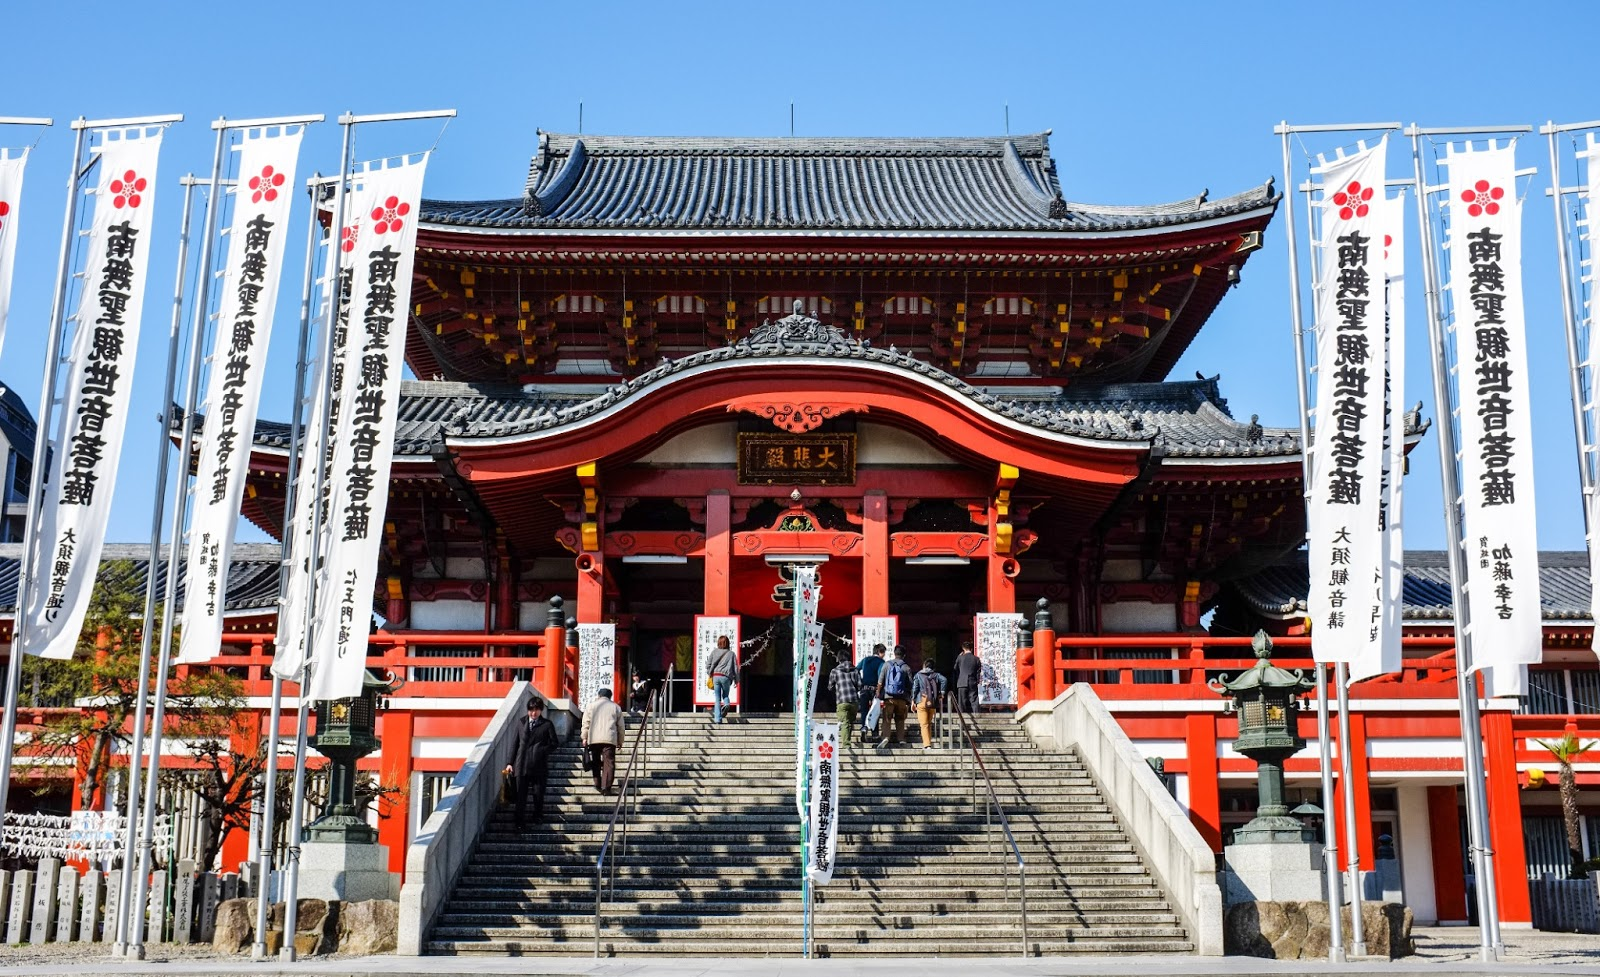 Travel & Adventures: Nagoya ( 名古屋 ). A voyage to Nagoya ...